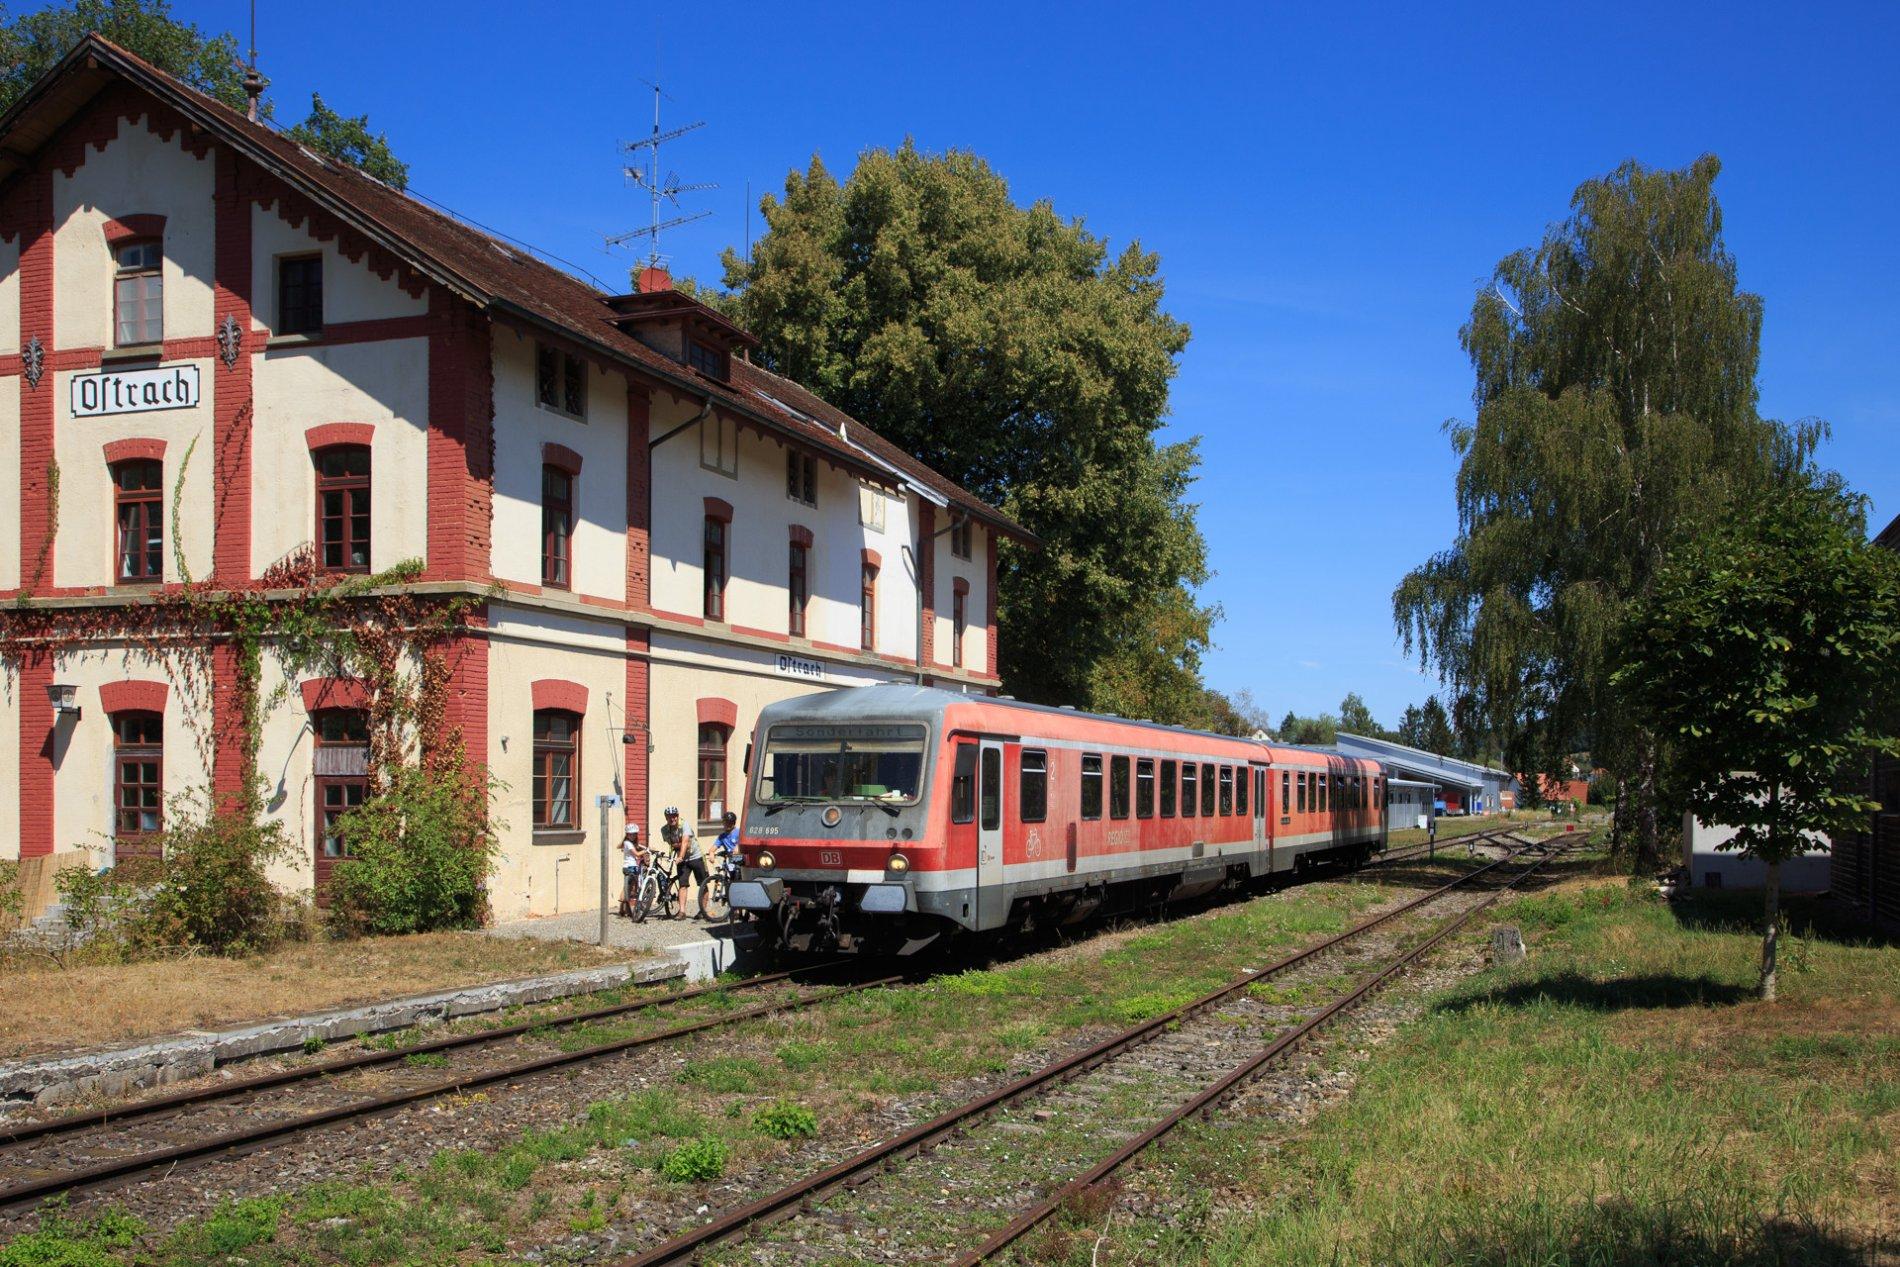 Bahnhofsgebäude Ostrach